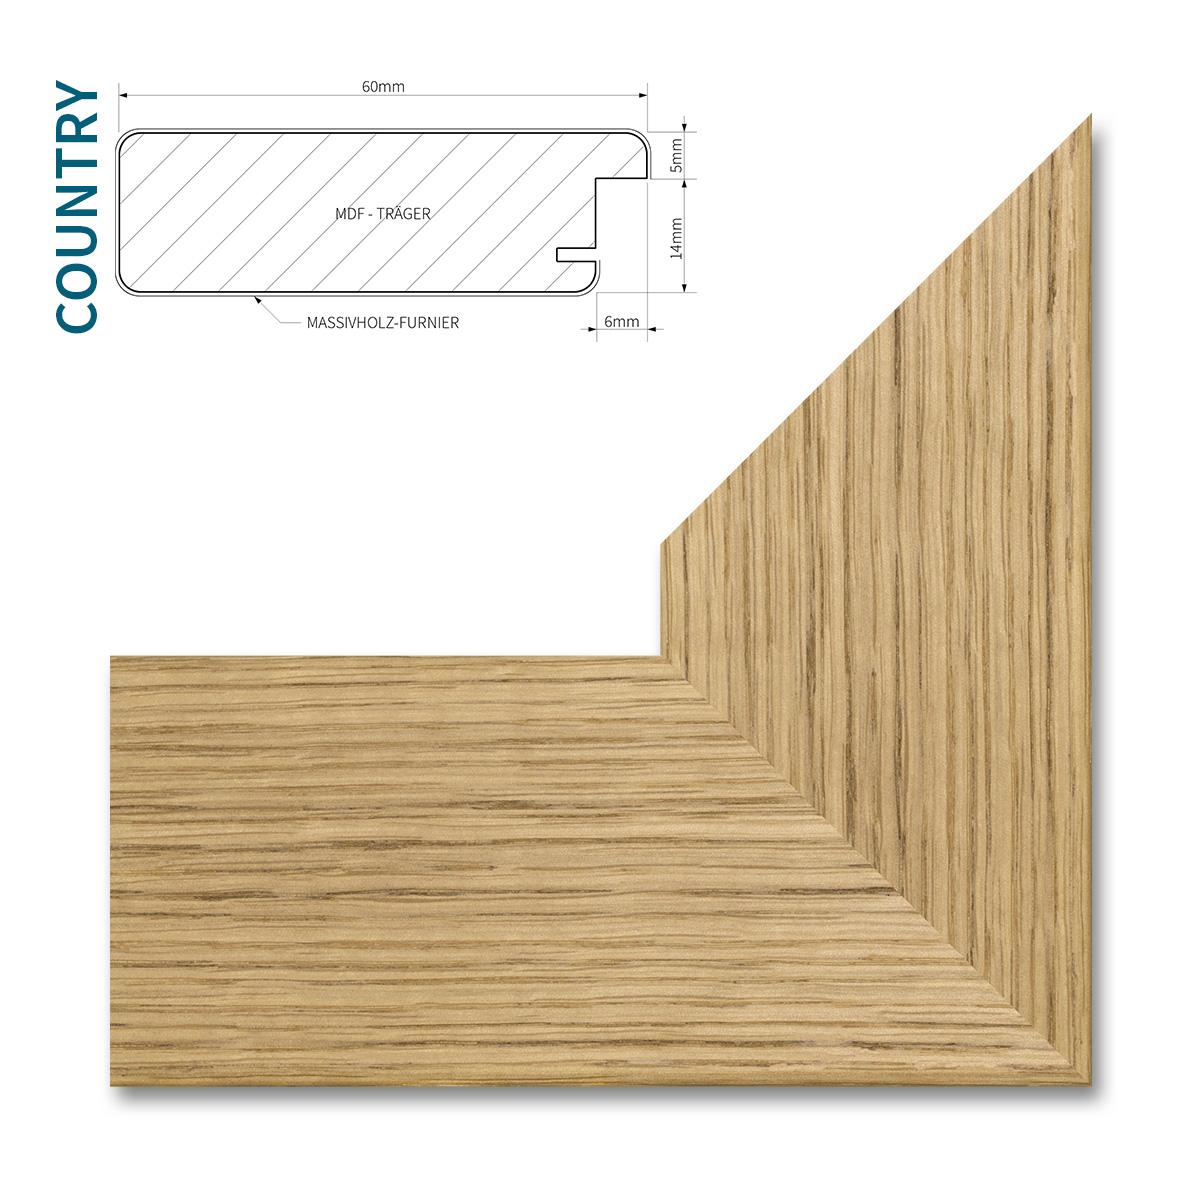 bilderrahmen mit echt holz furnier xl gr en galerie poster foto profil rahmen ebay. Black Bedroom Furniture Sets. Home Design Ideas